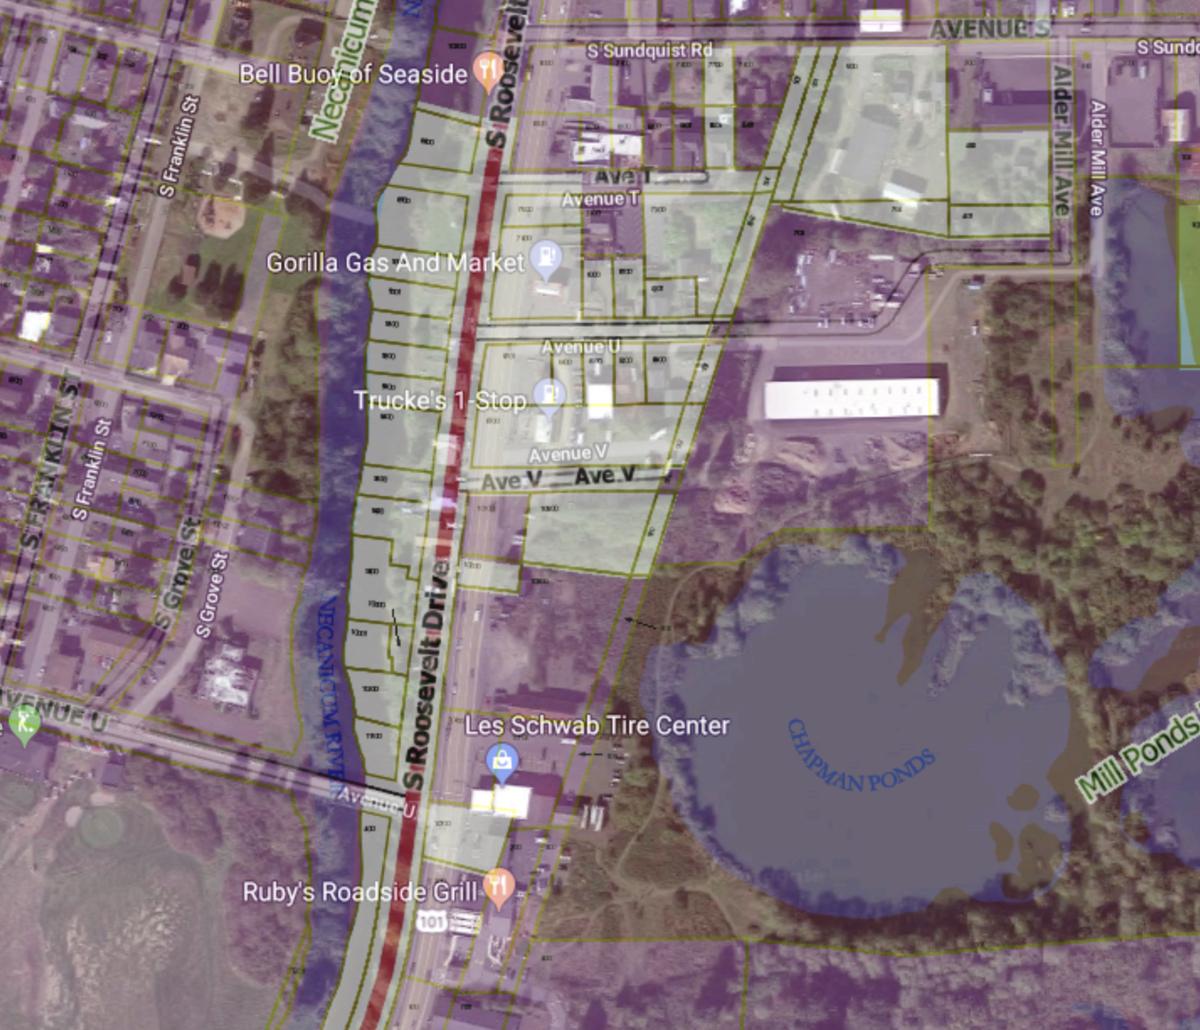 Seaside annexation plan